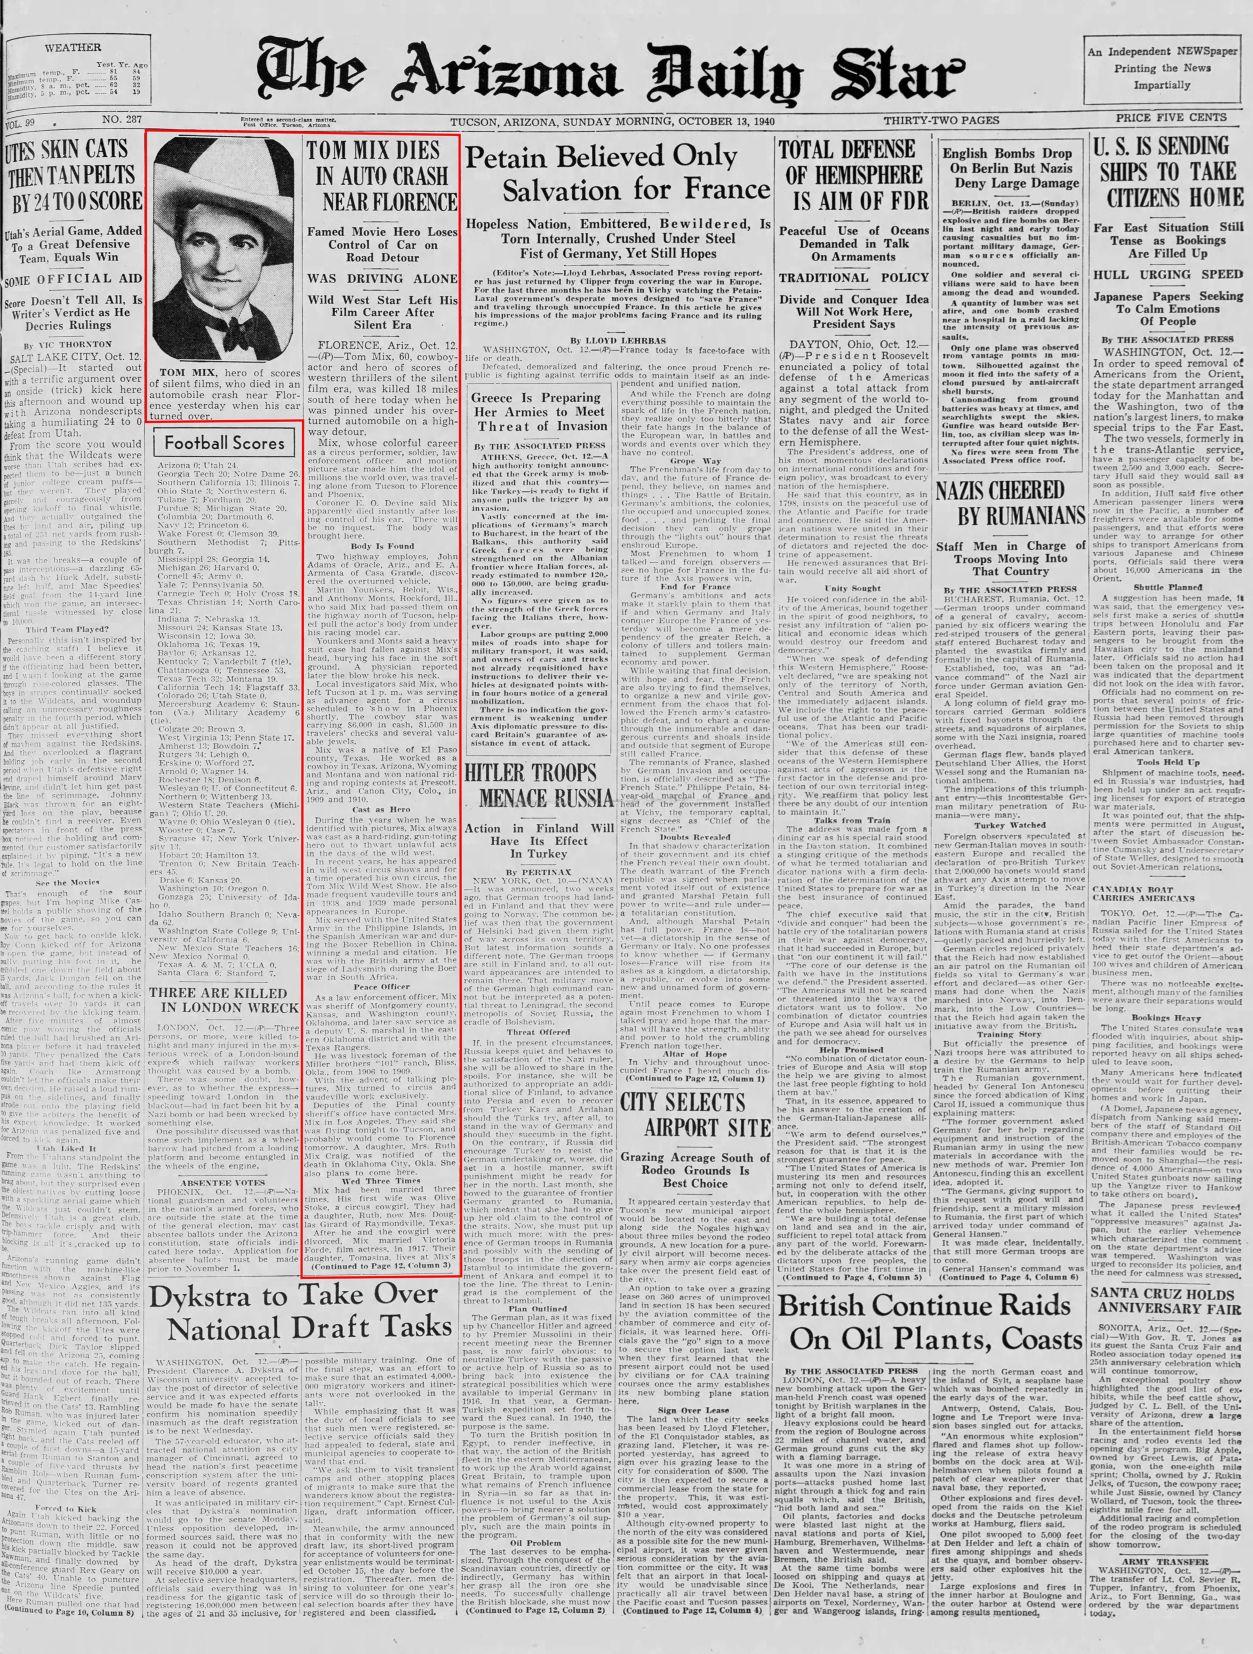 Oct. 13, 1940: Tom Mix dies near Florence, Arizona